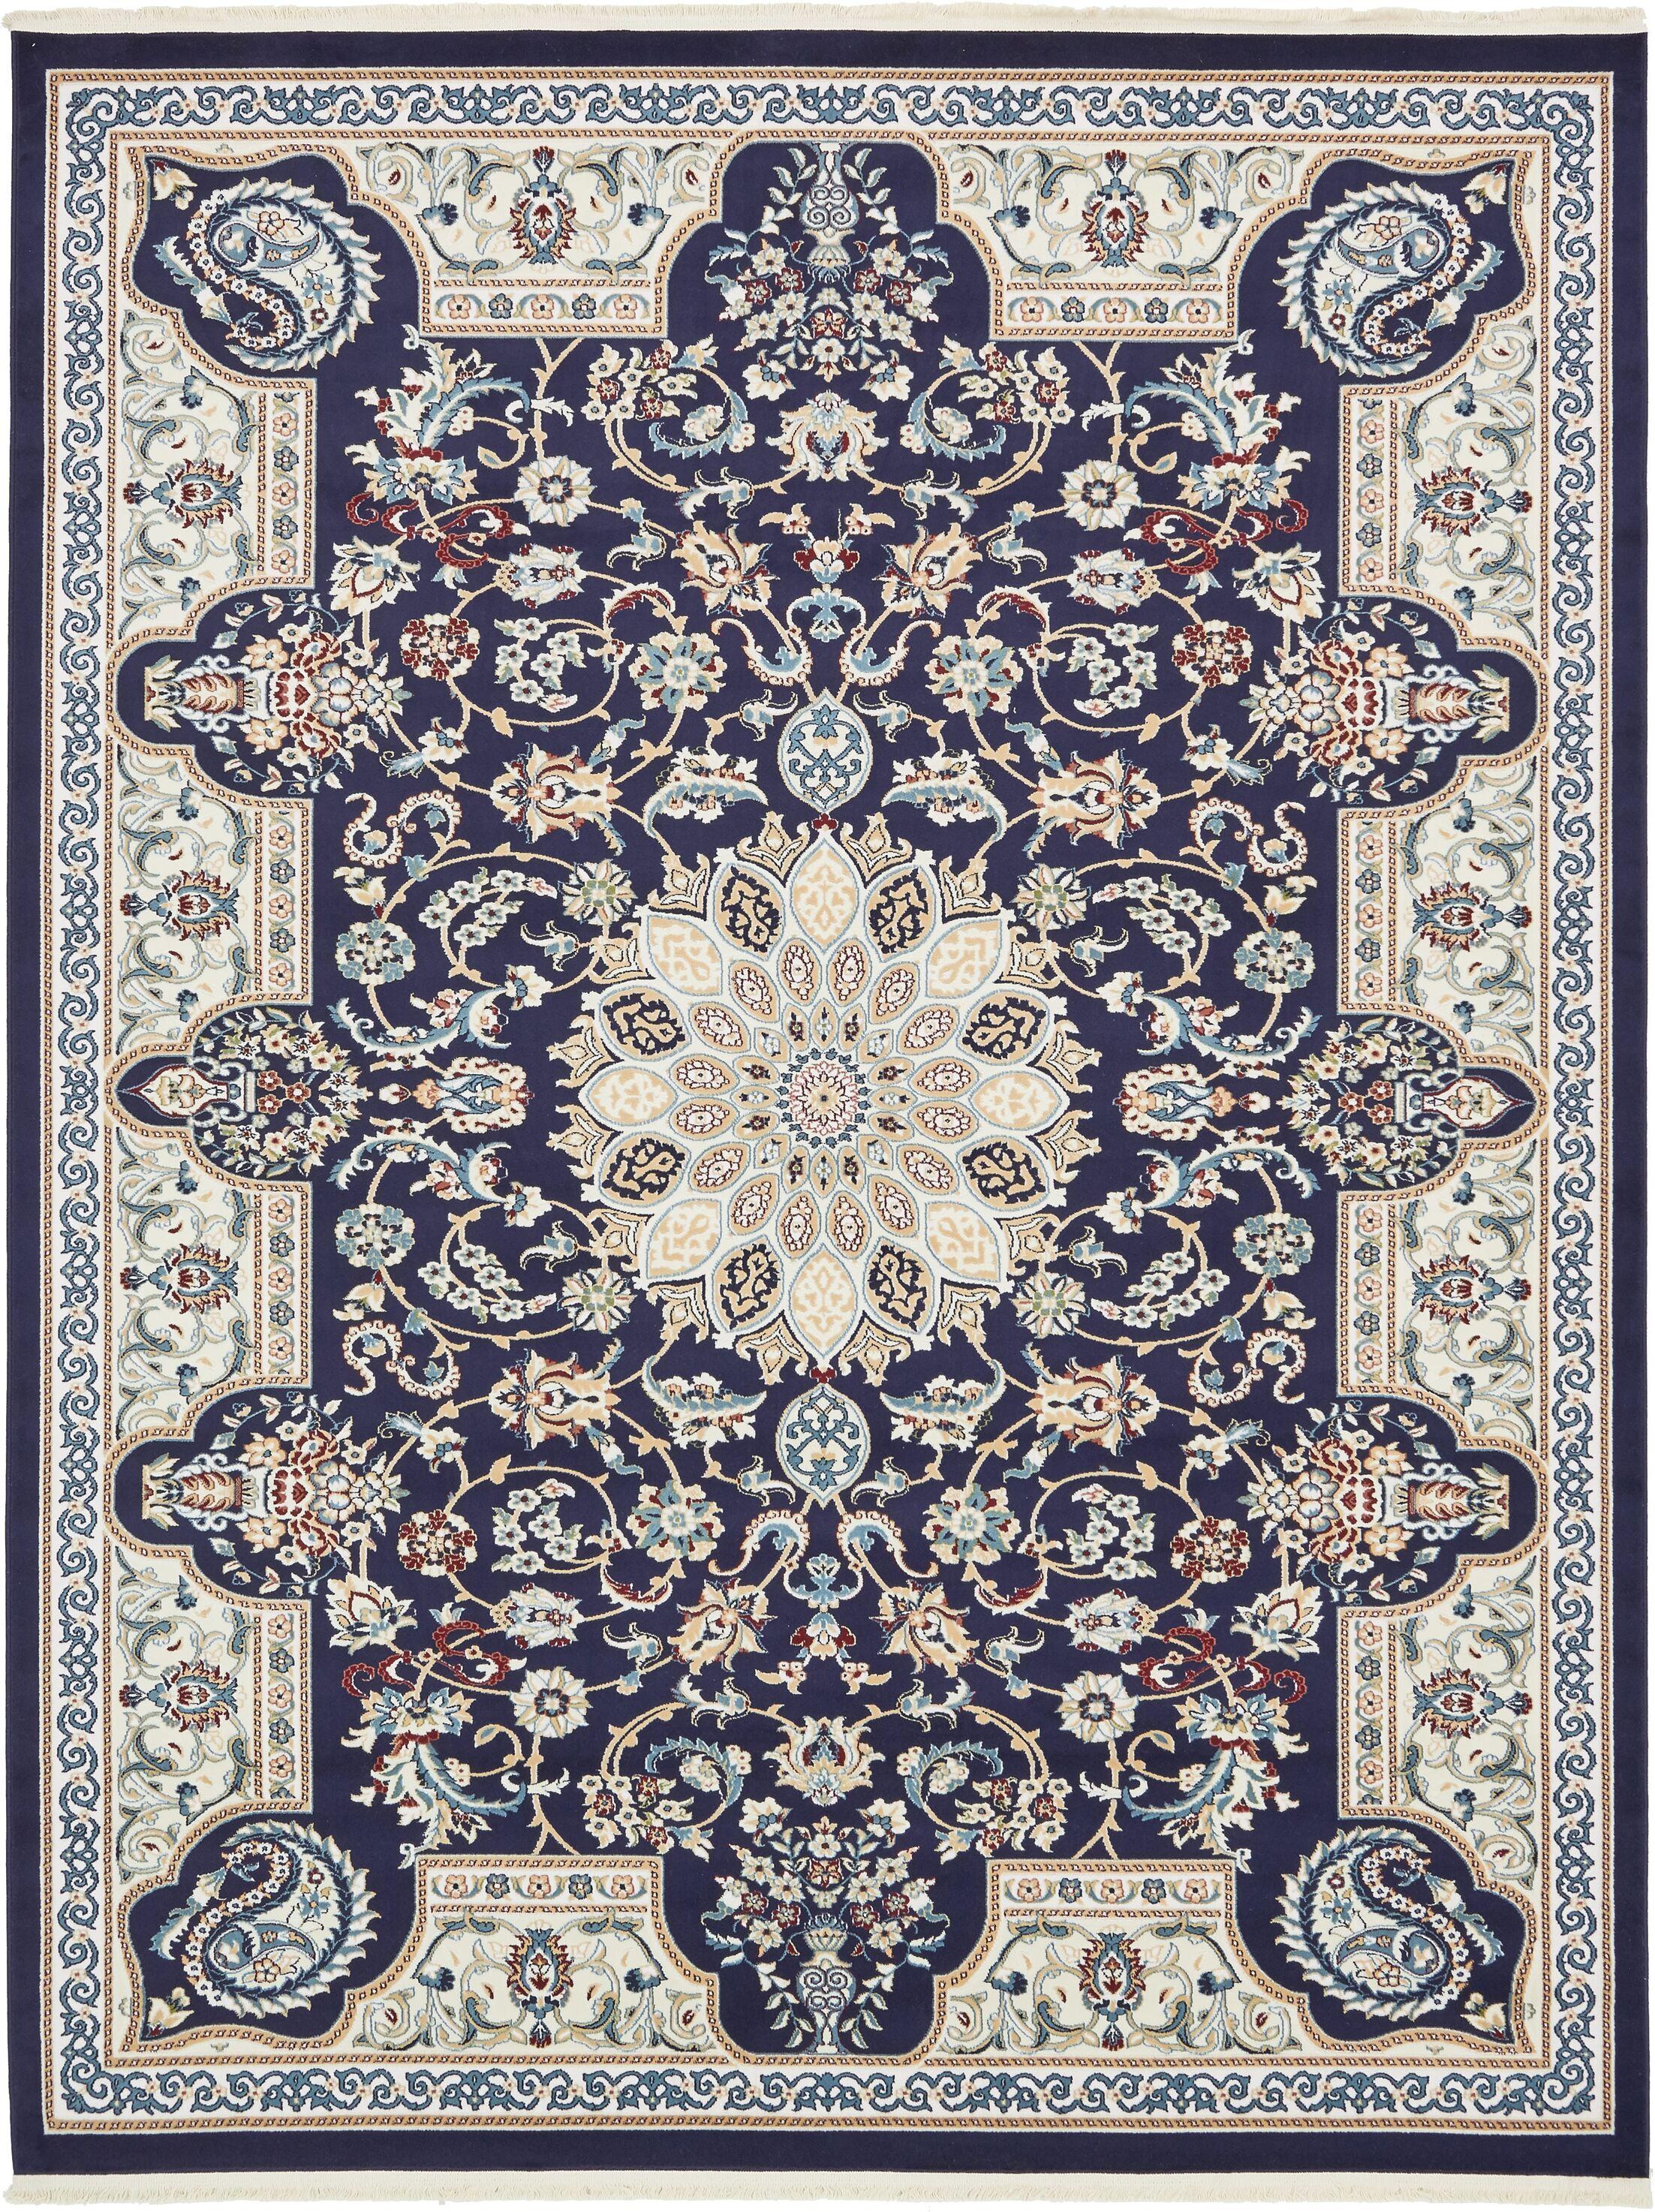 Jackson Navy Blue Area Rug Rug Size: Rectangle 8' x 10'